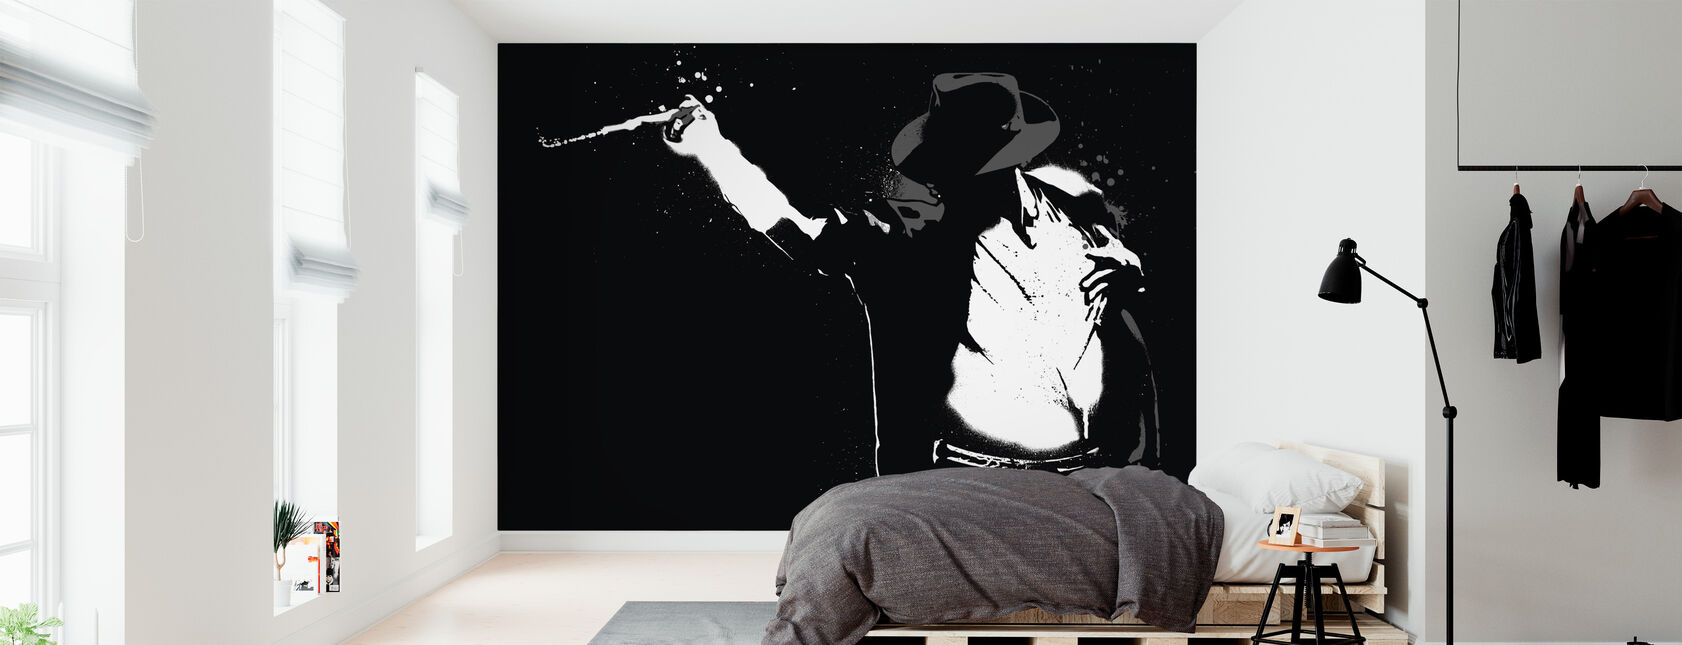 Jackson - Wallpaper - Bedroom